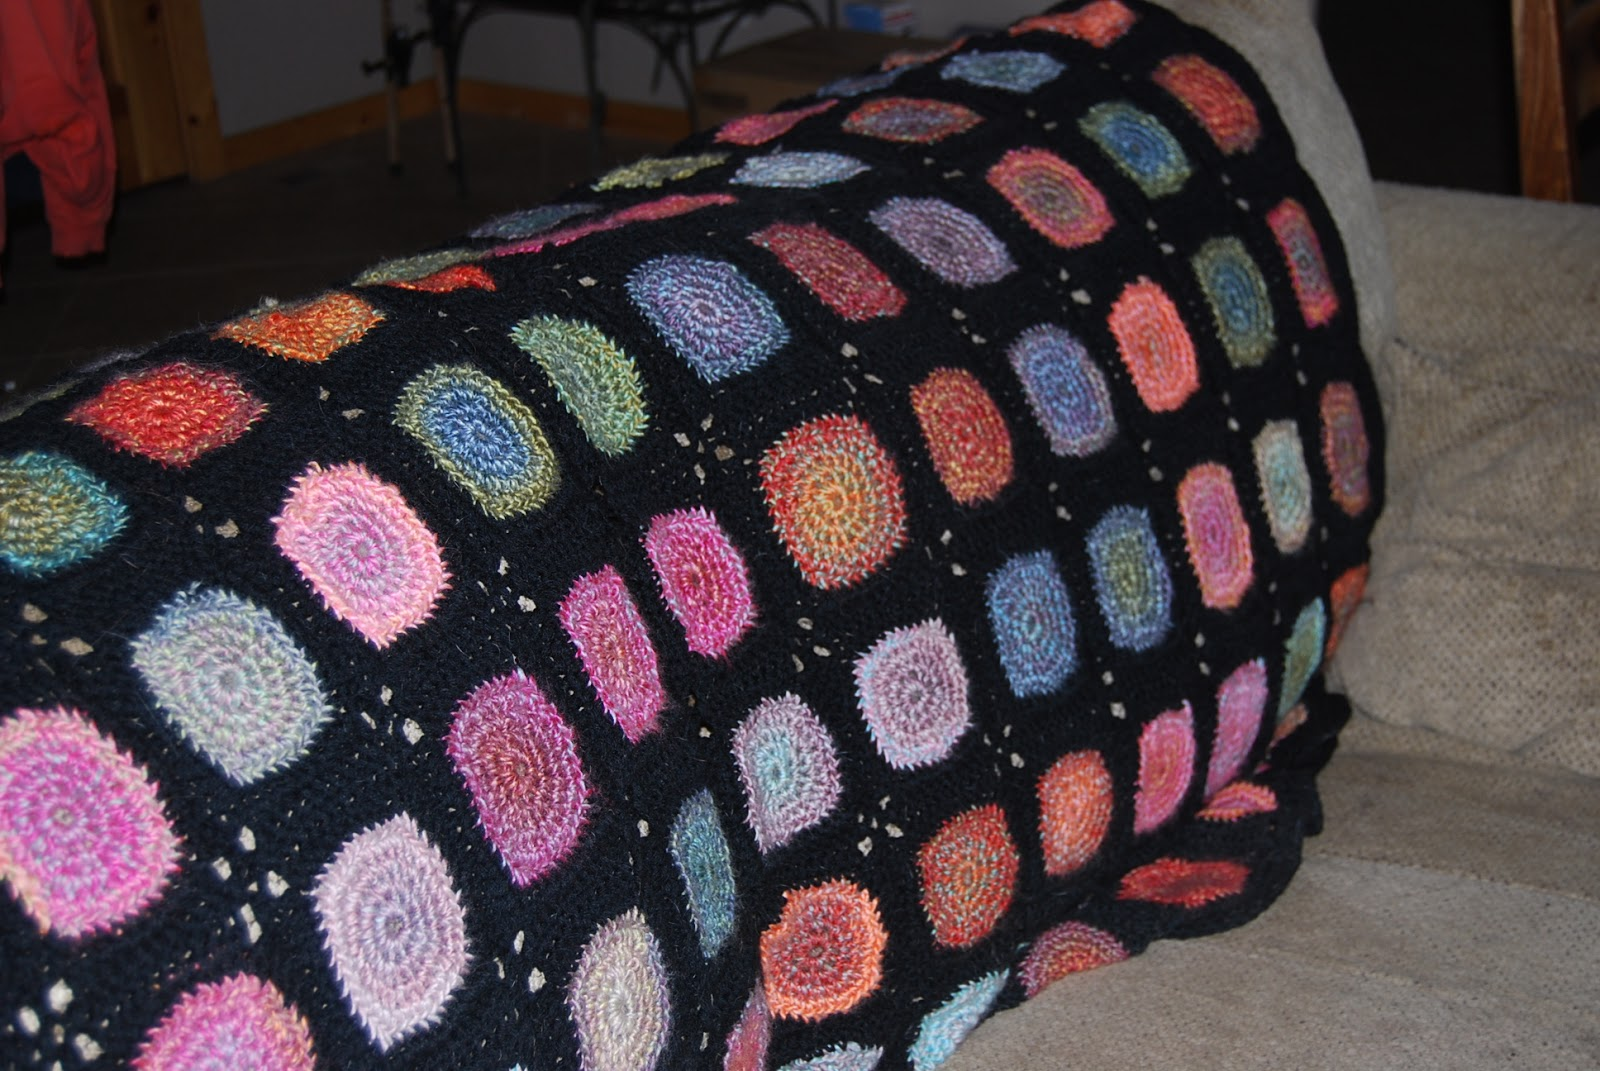 Wilamar Farm: More Crochet